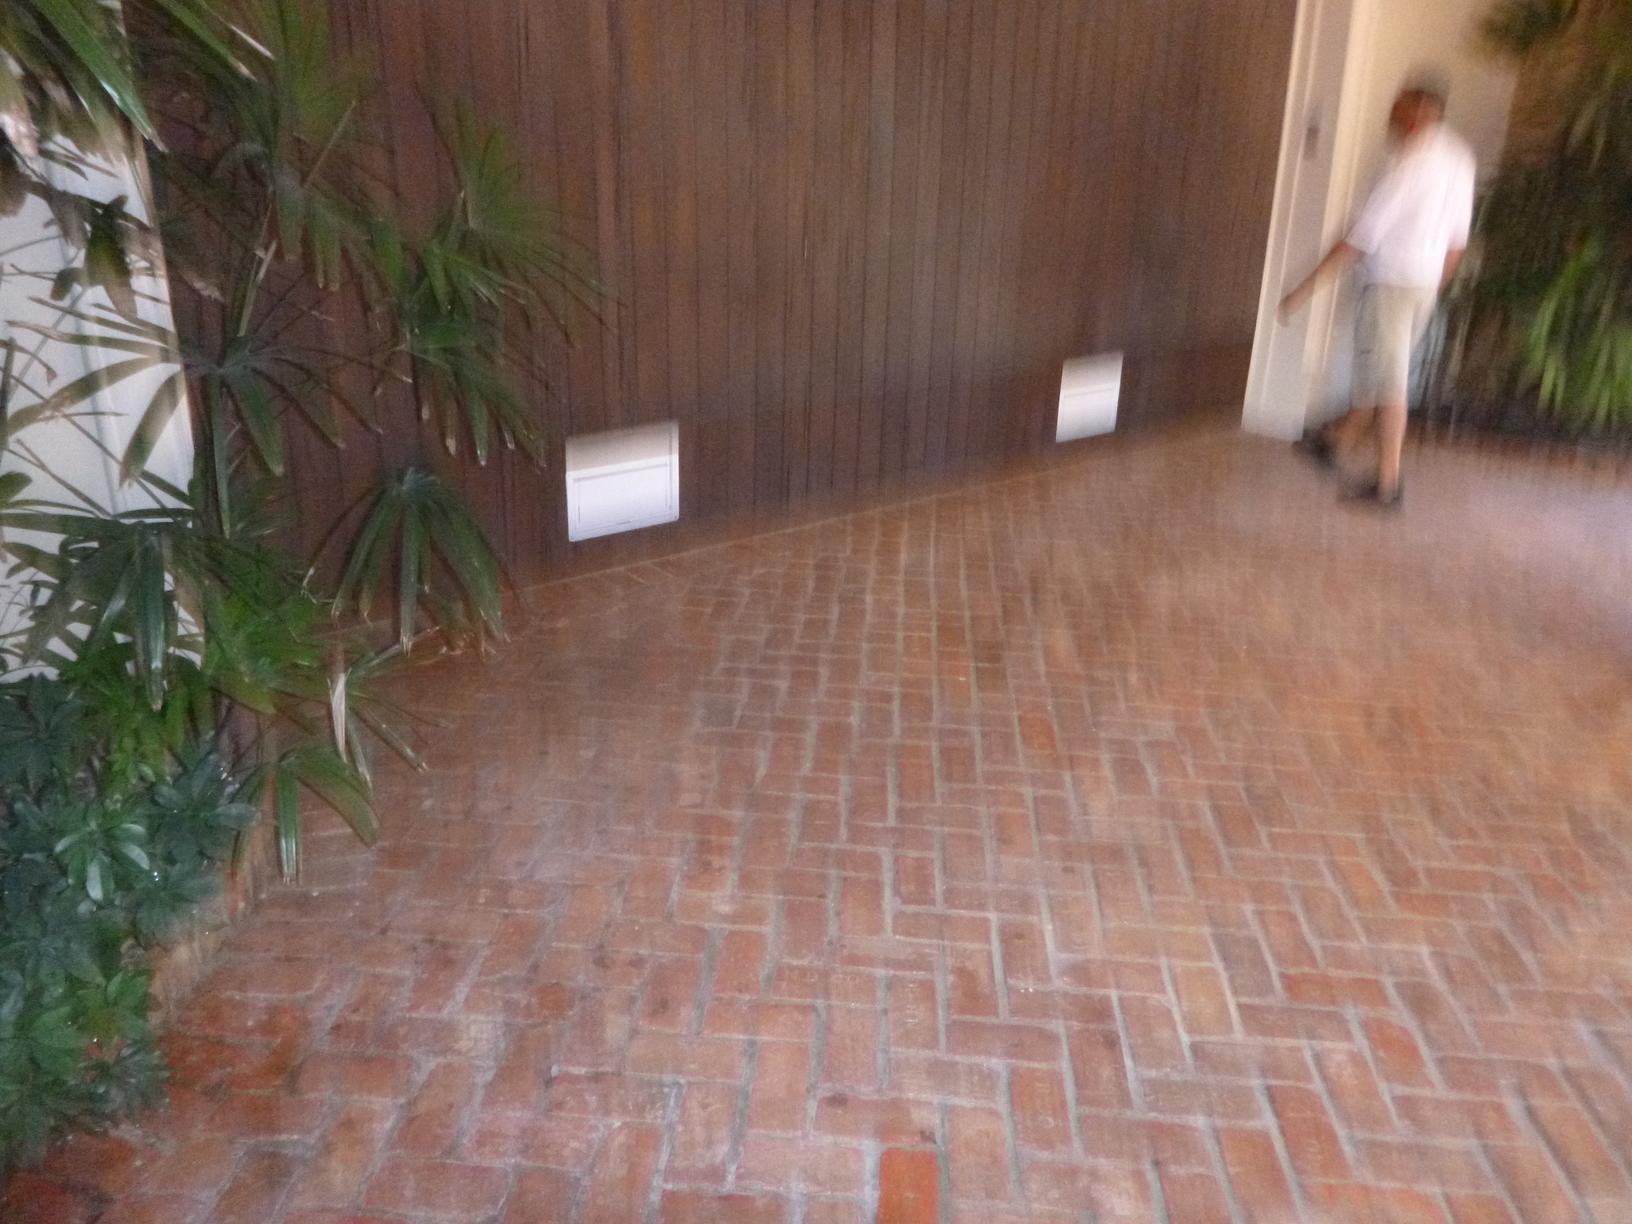 Crawl Space Repair Smart Vent Installation In Boca Raton Fl Smart Vent Installation